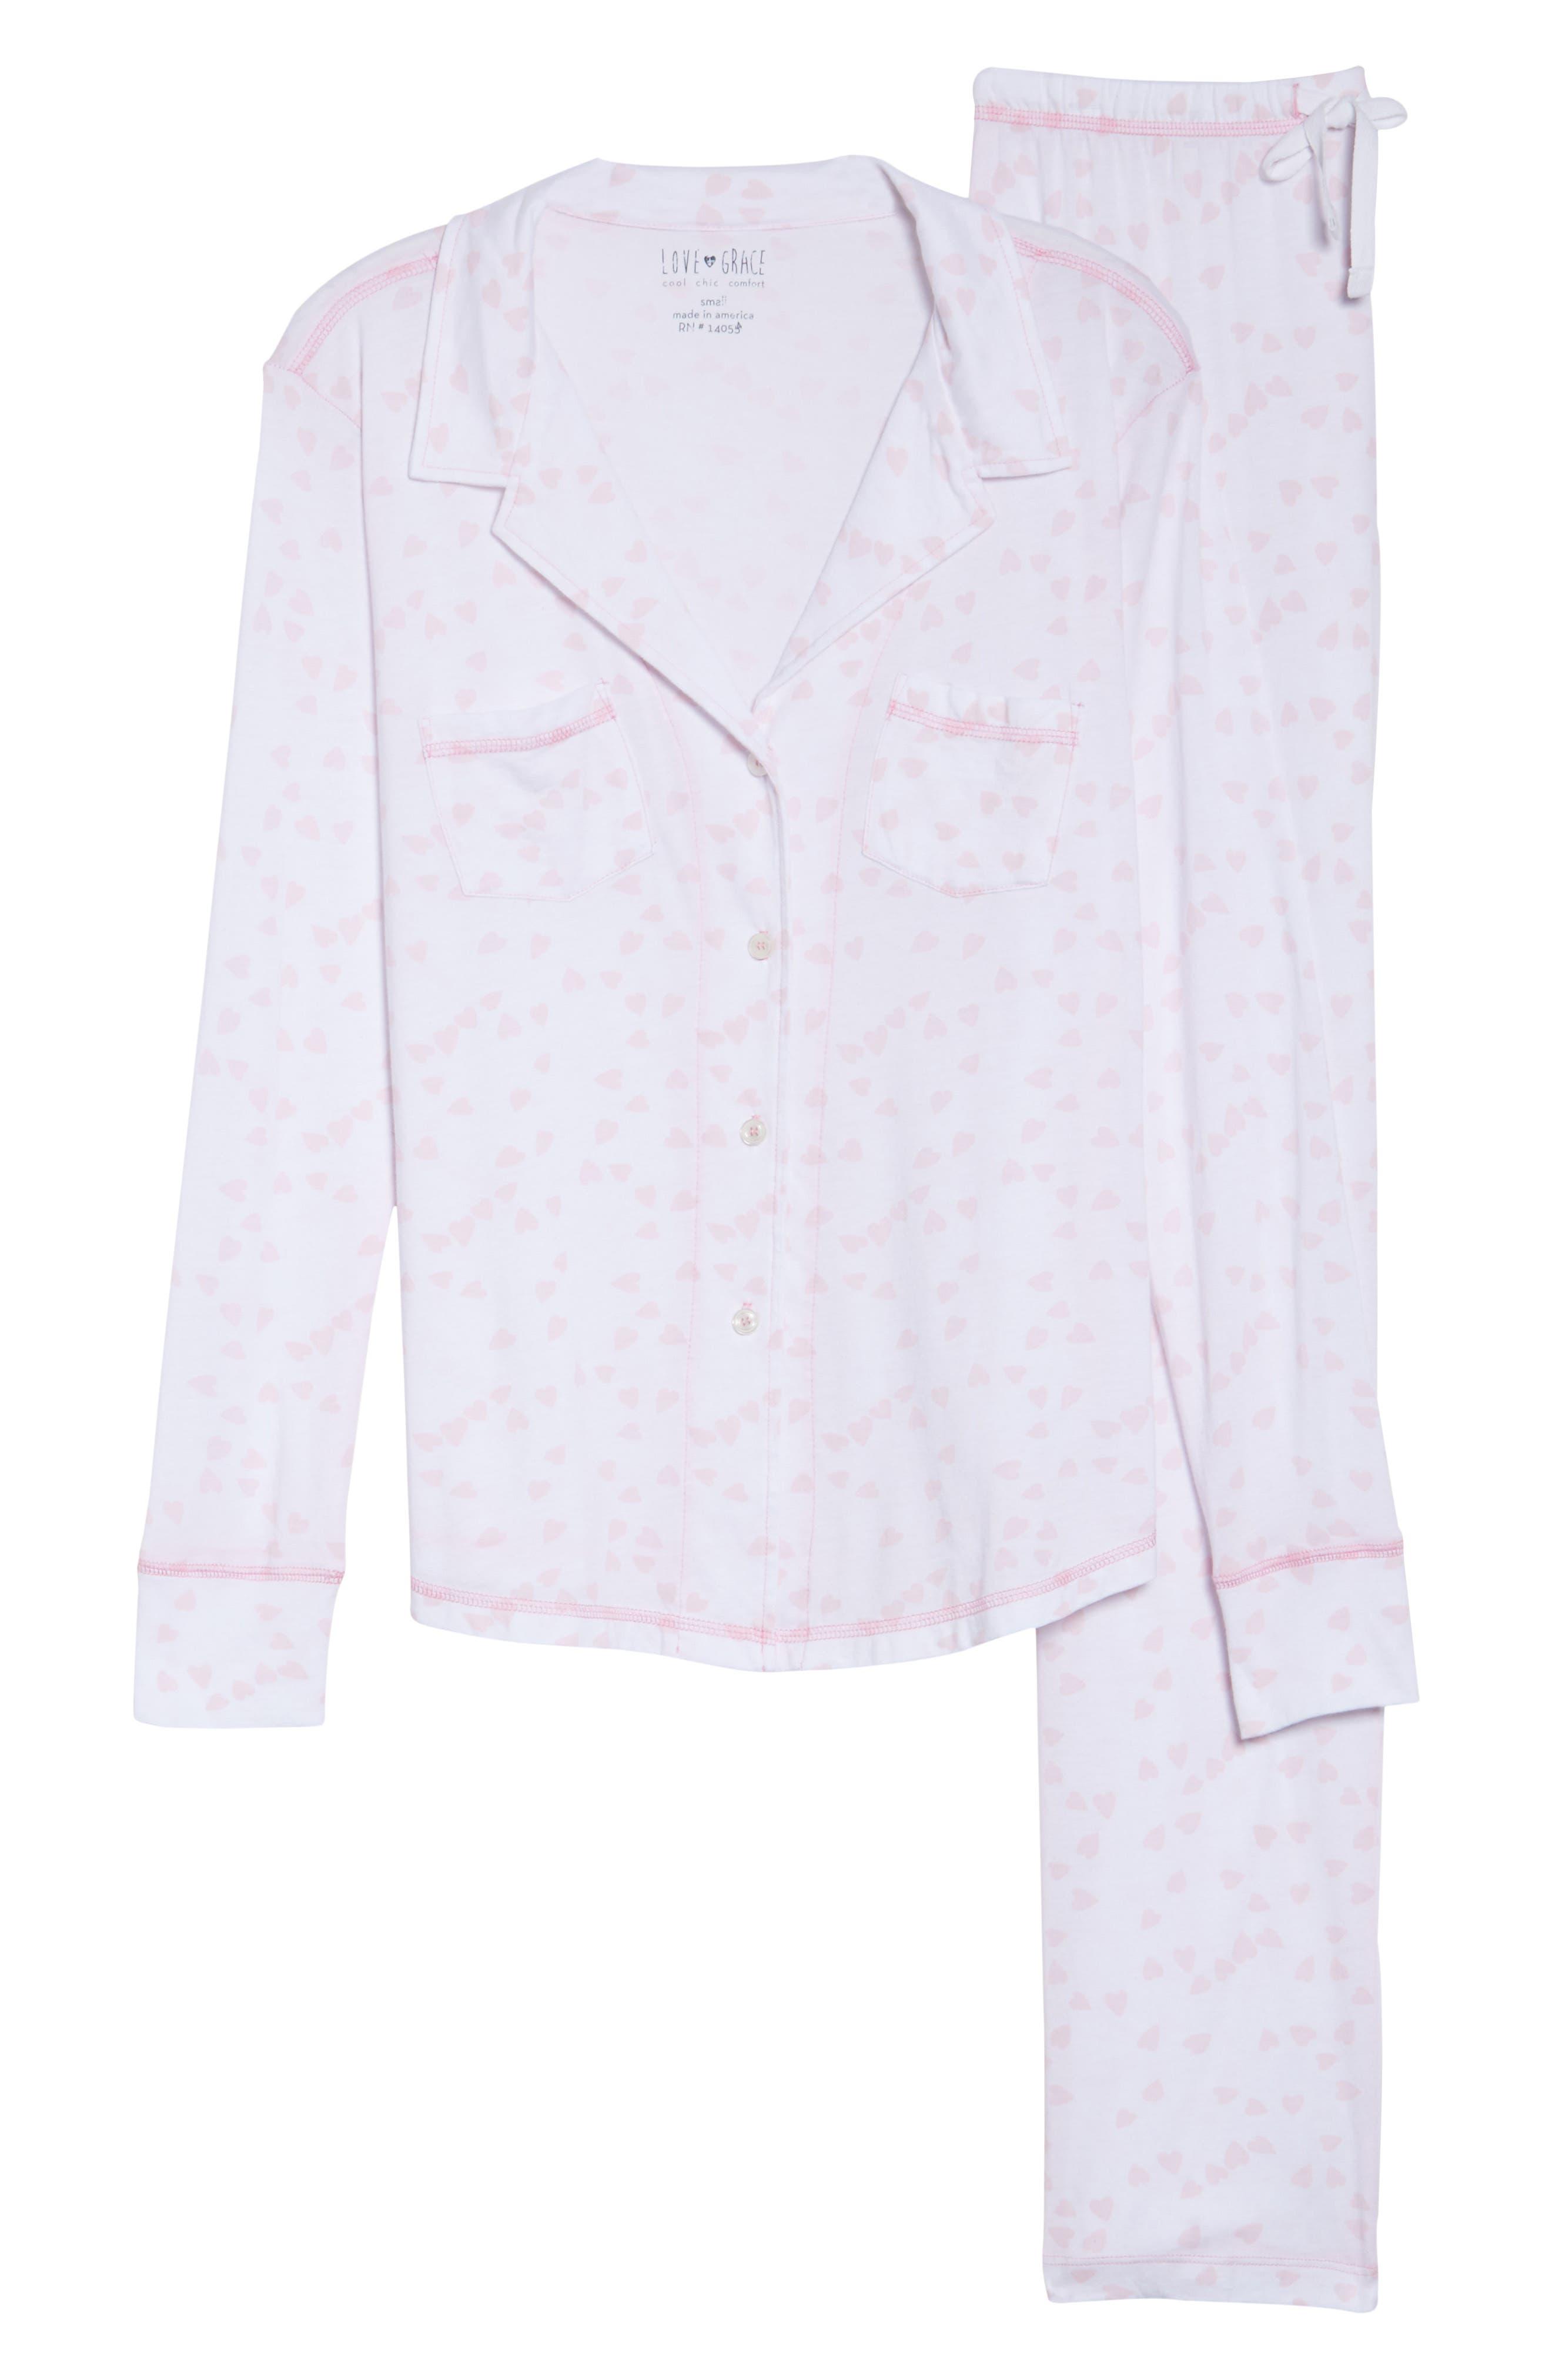 Cassie Pajamas,                             Alternate thumbnail 6, color,                             650